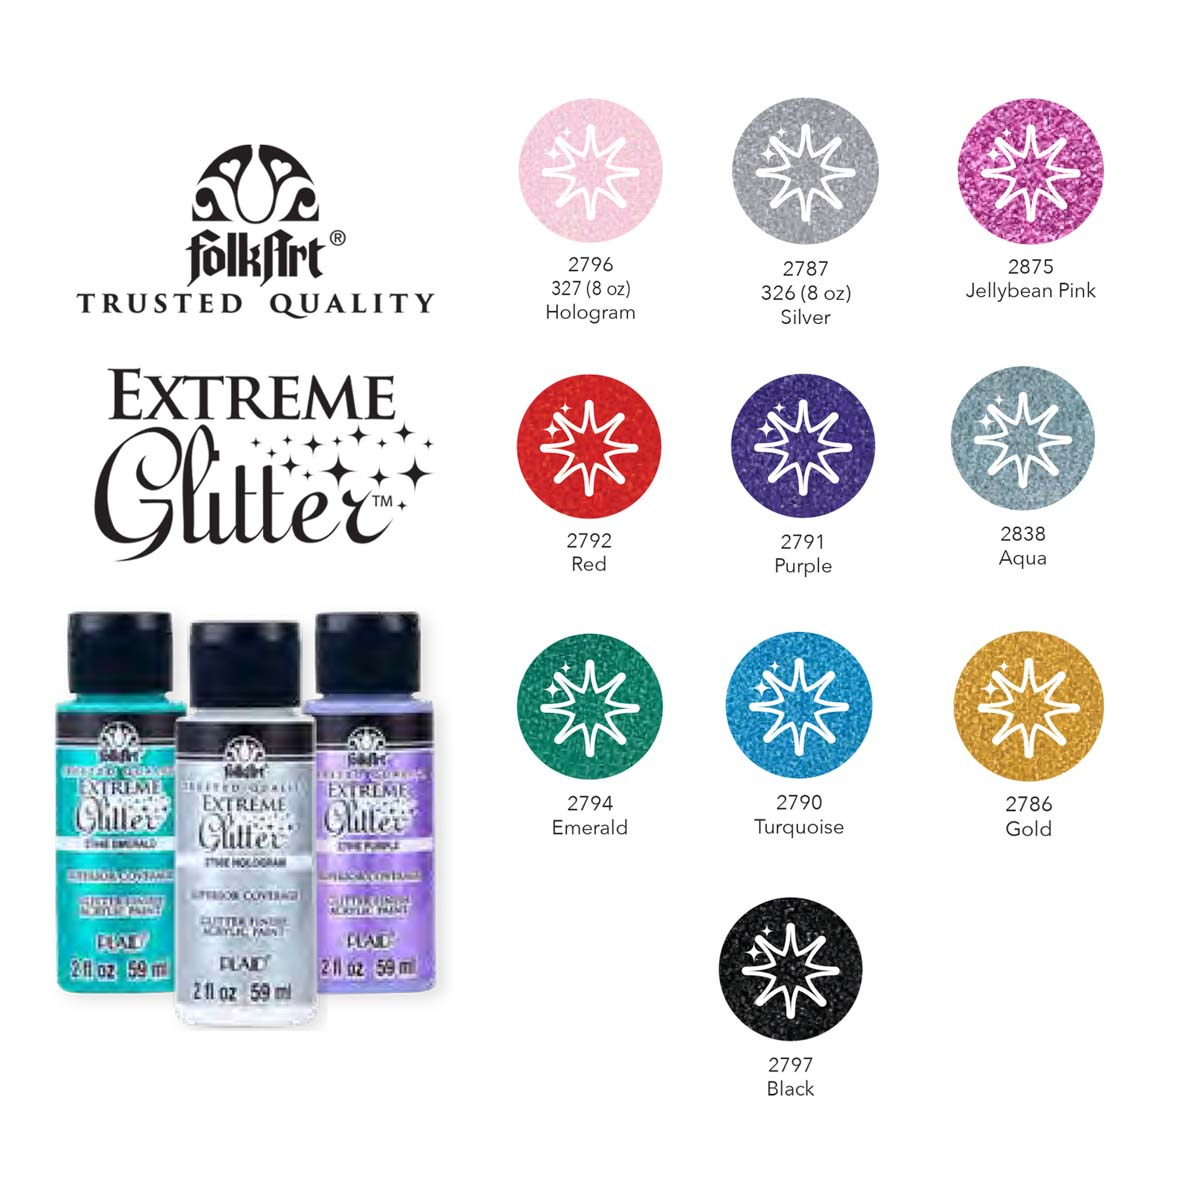 FolkArt ® Extreme Glitter™ 10 Color Set - PROMOFAGLT